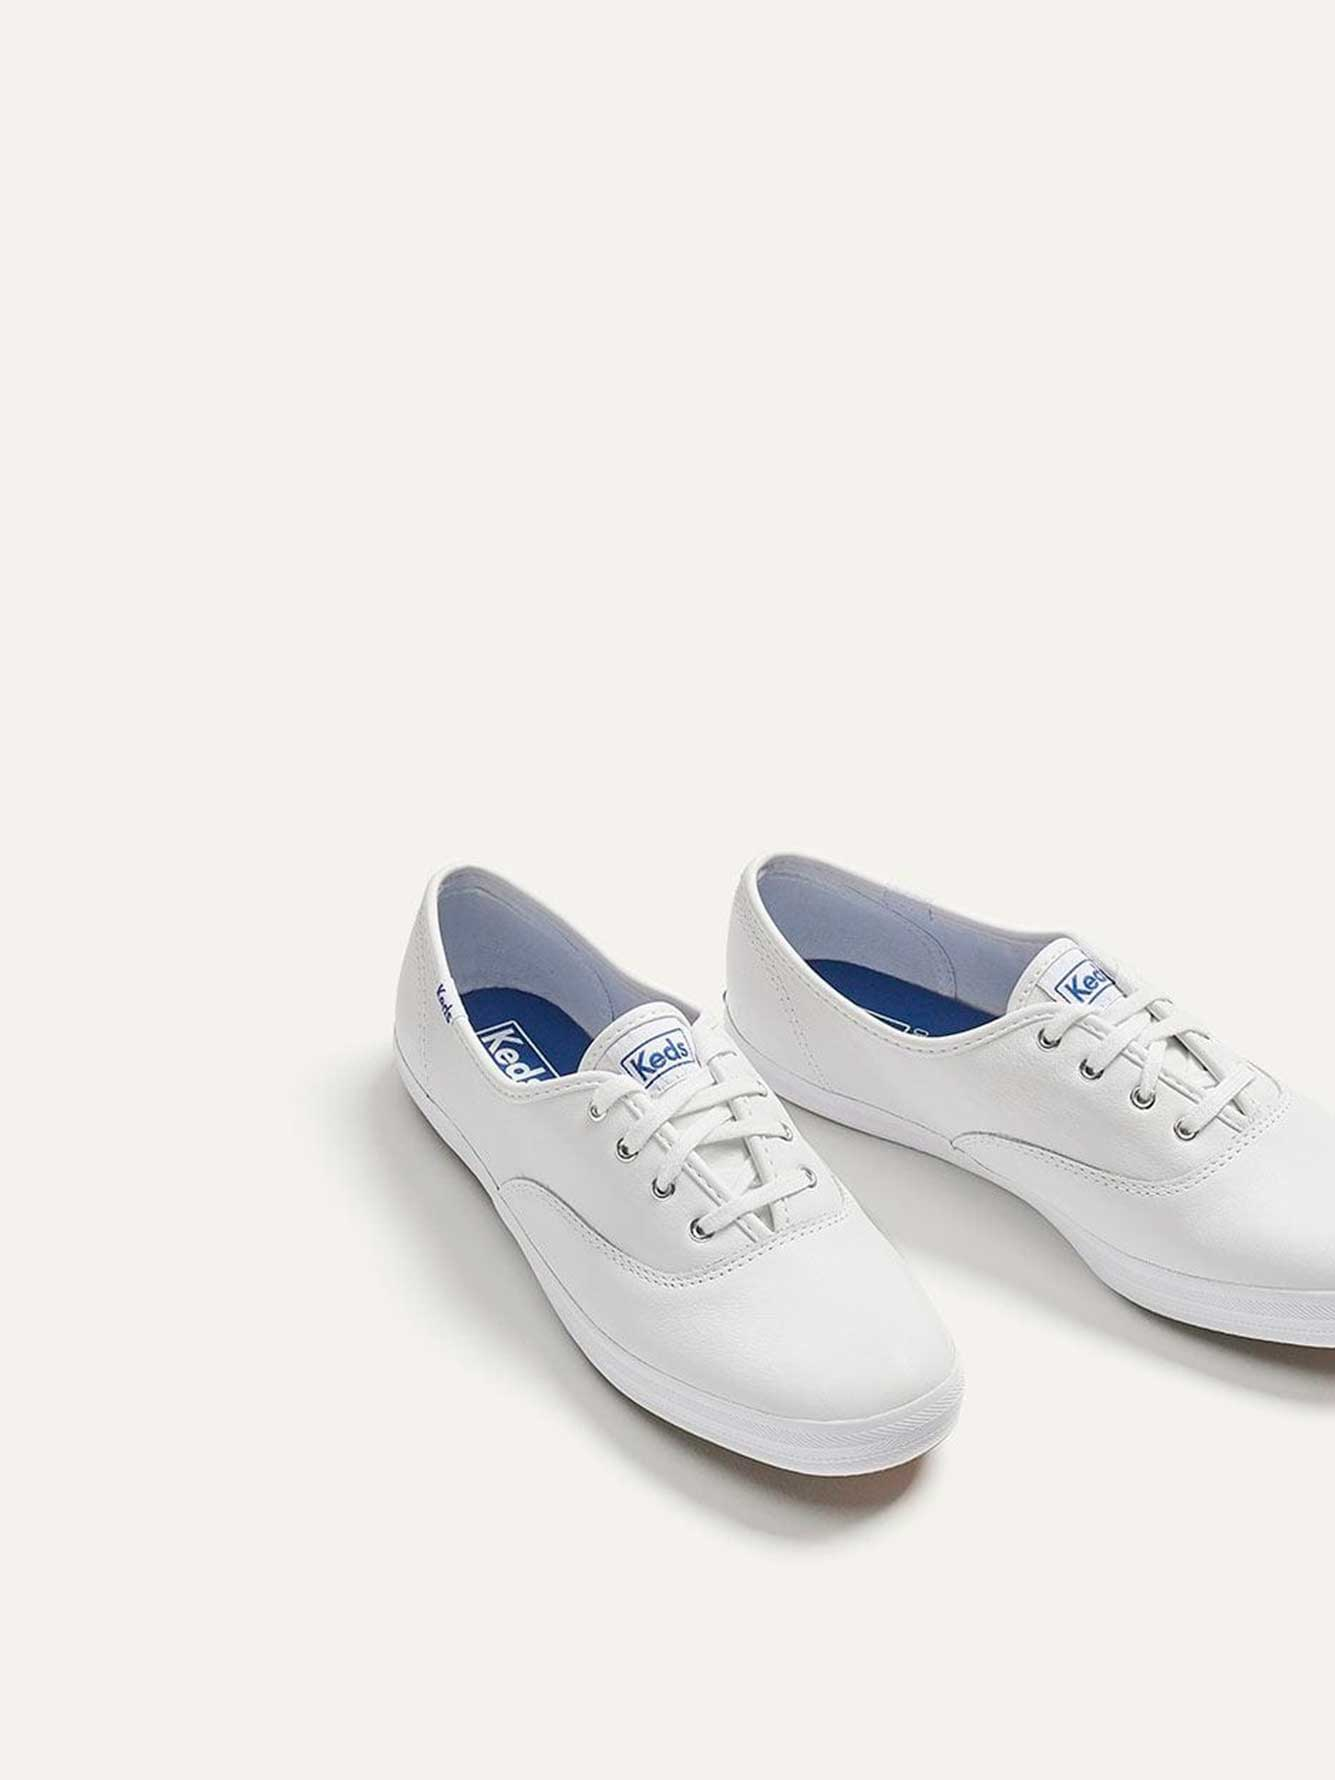 052e8684ab9c2 Wide Champion Oxford Leather Shoes - Keds | Penningtons